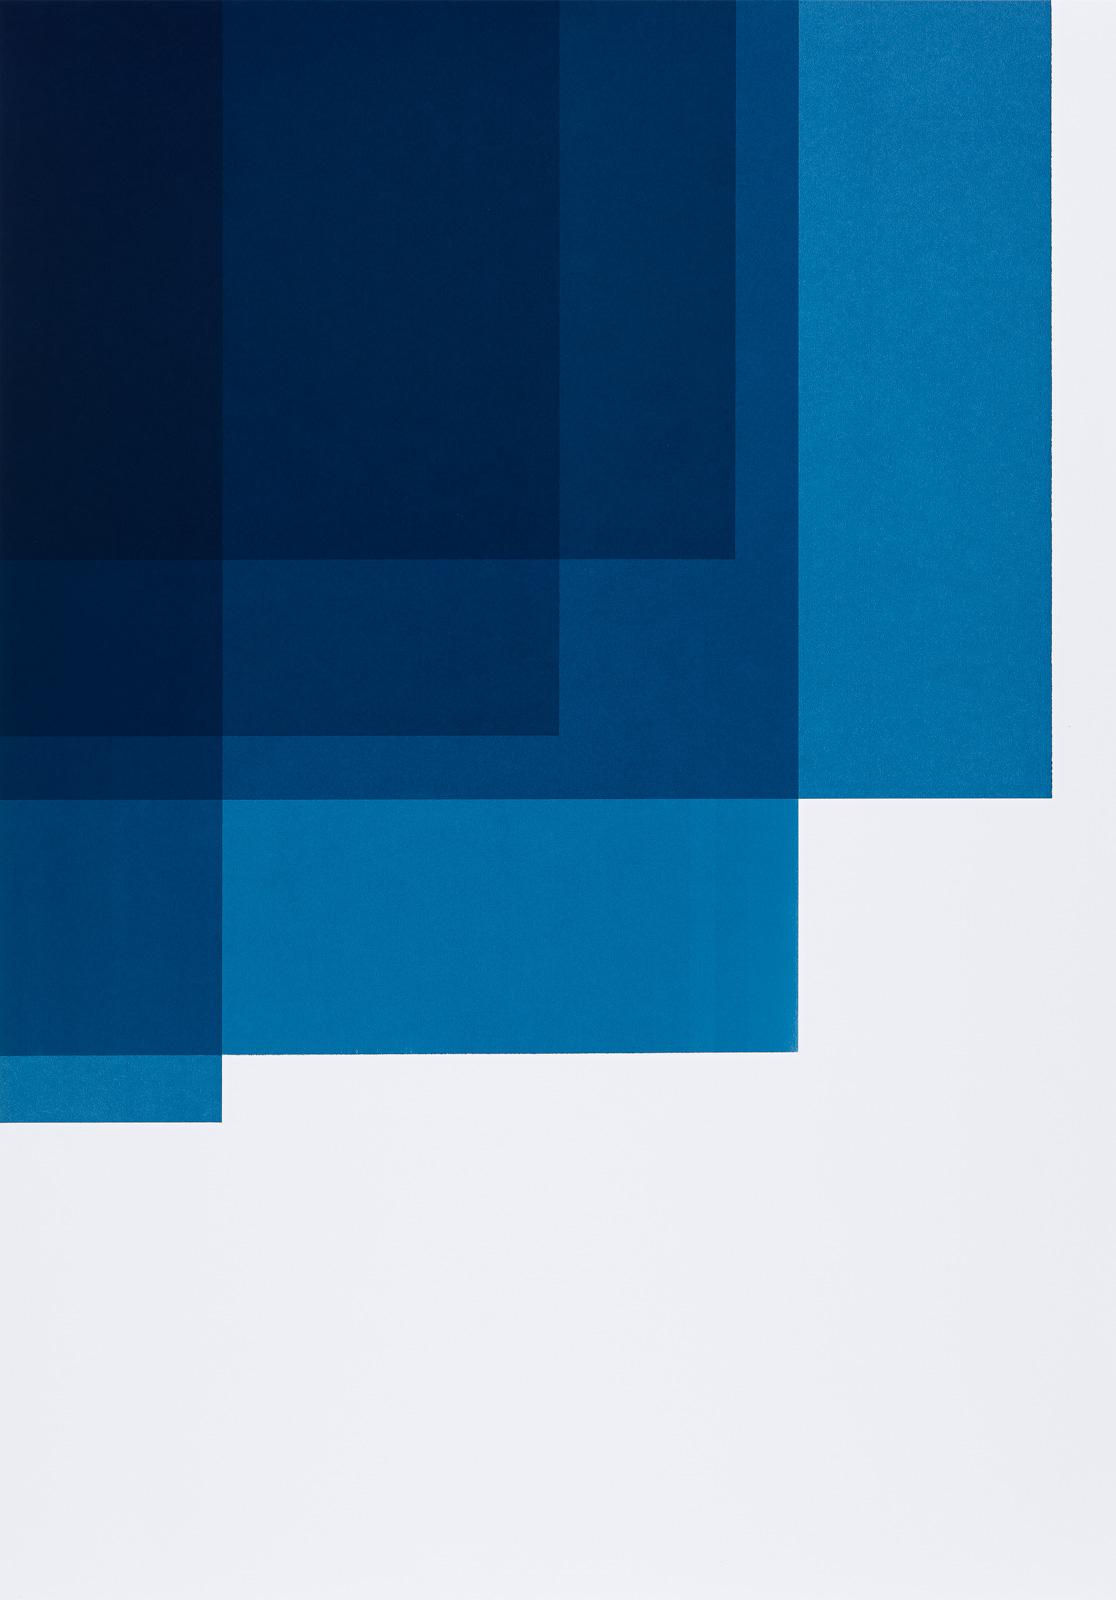 Katrine Giæver, Collecting Colors (Indigo II), 2016, Silkscreen print, 100 x 70 cm, Custom frame with museum glass, Edition 4